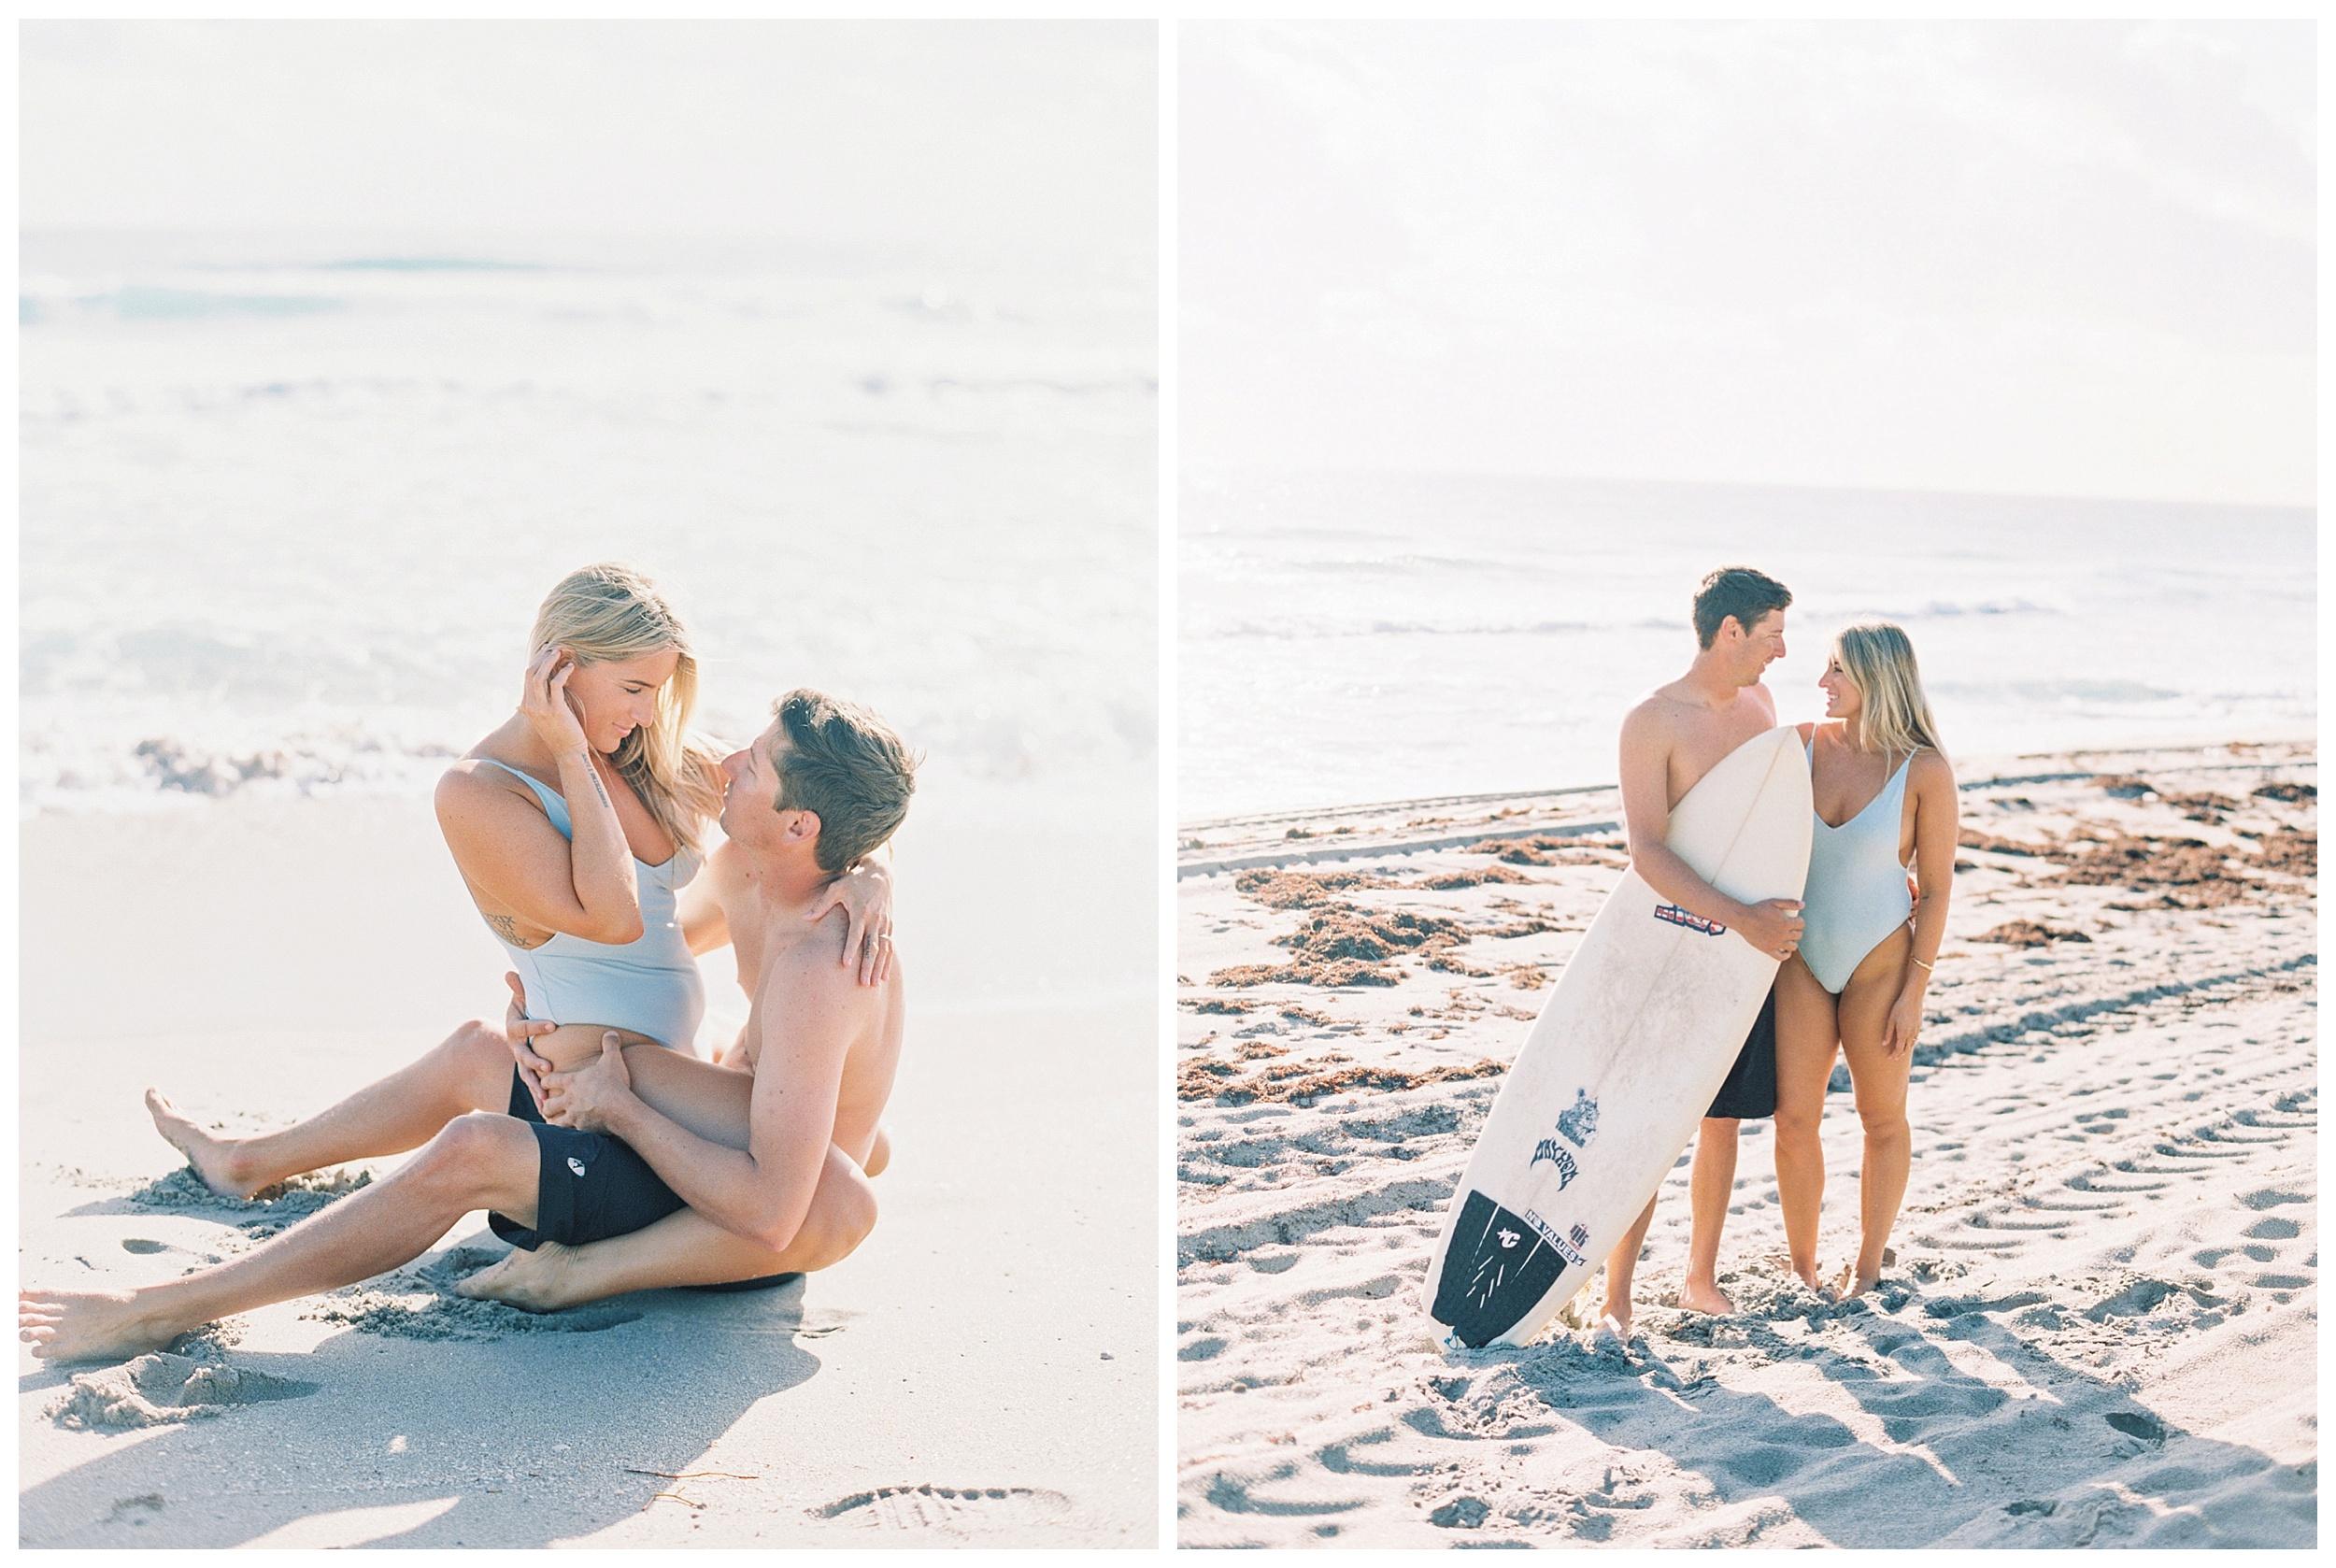 Surfboard Engagement Florida Wedding Photographer Kir Tuben_0032.jpg